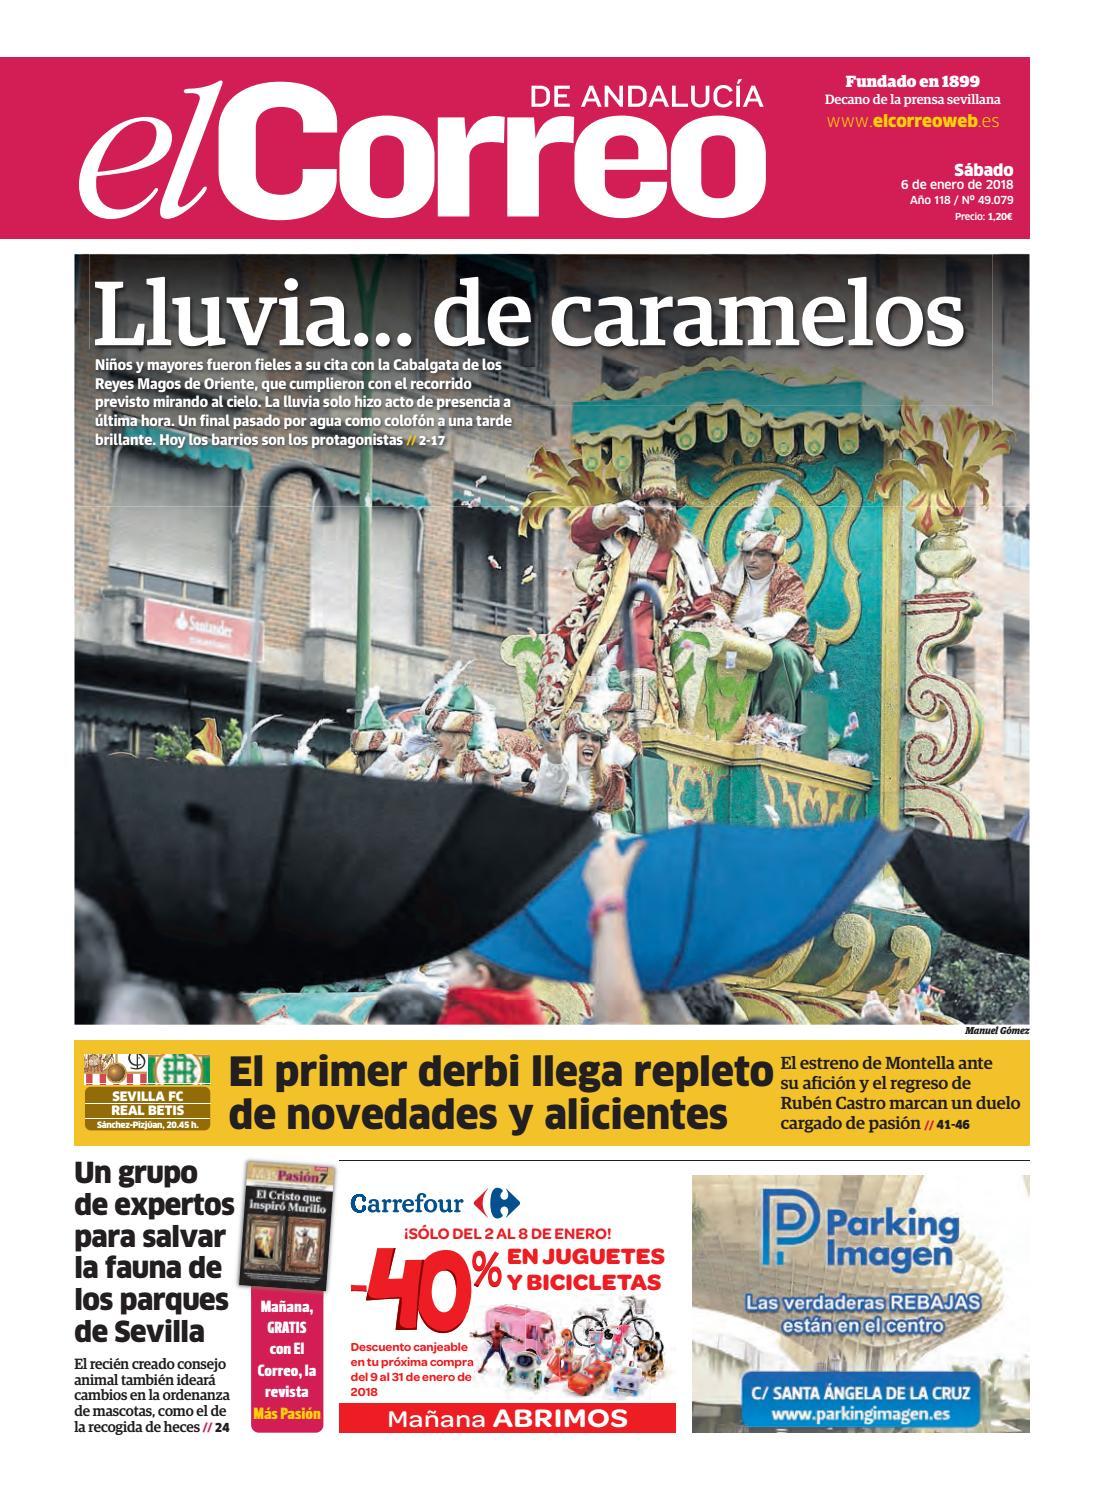 06 By 2018 Correo lIssuu Andalucía De 01 S El k08PnwXO